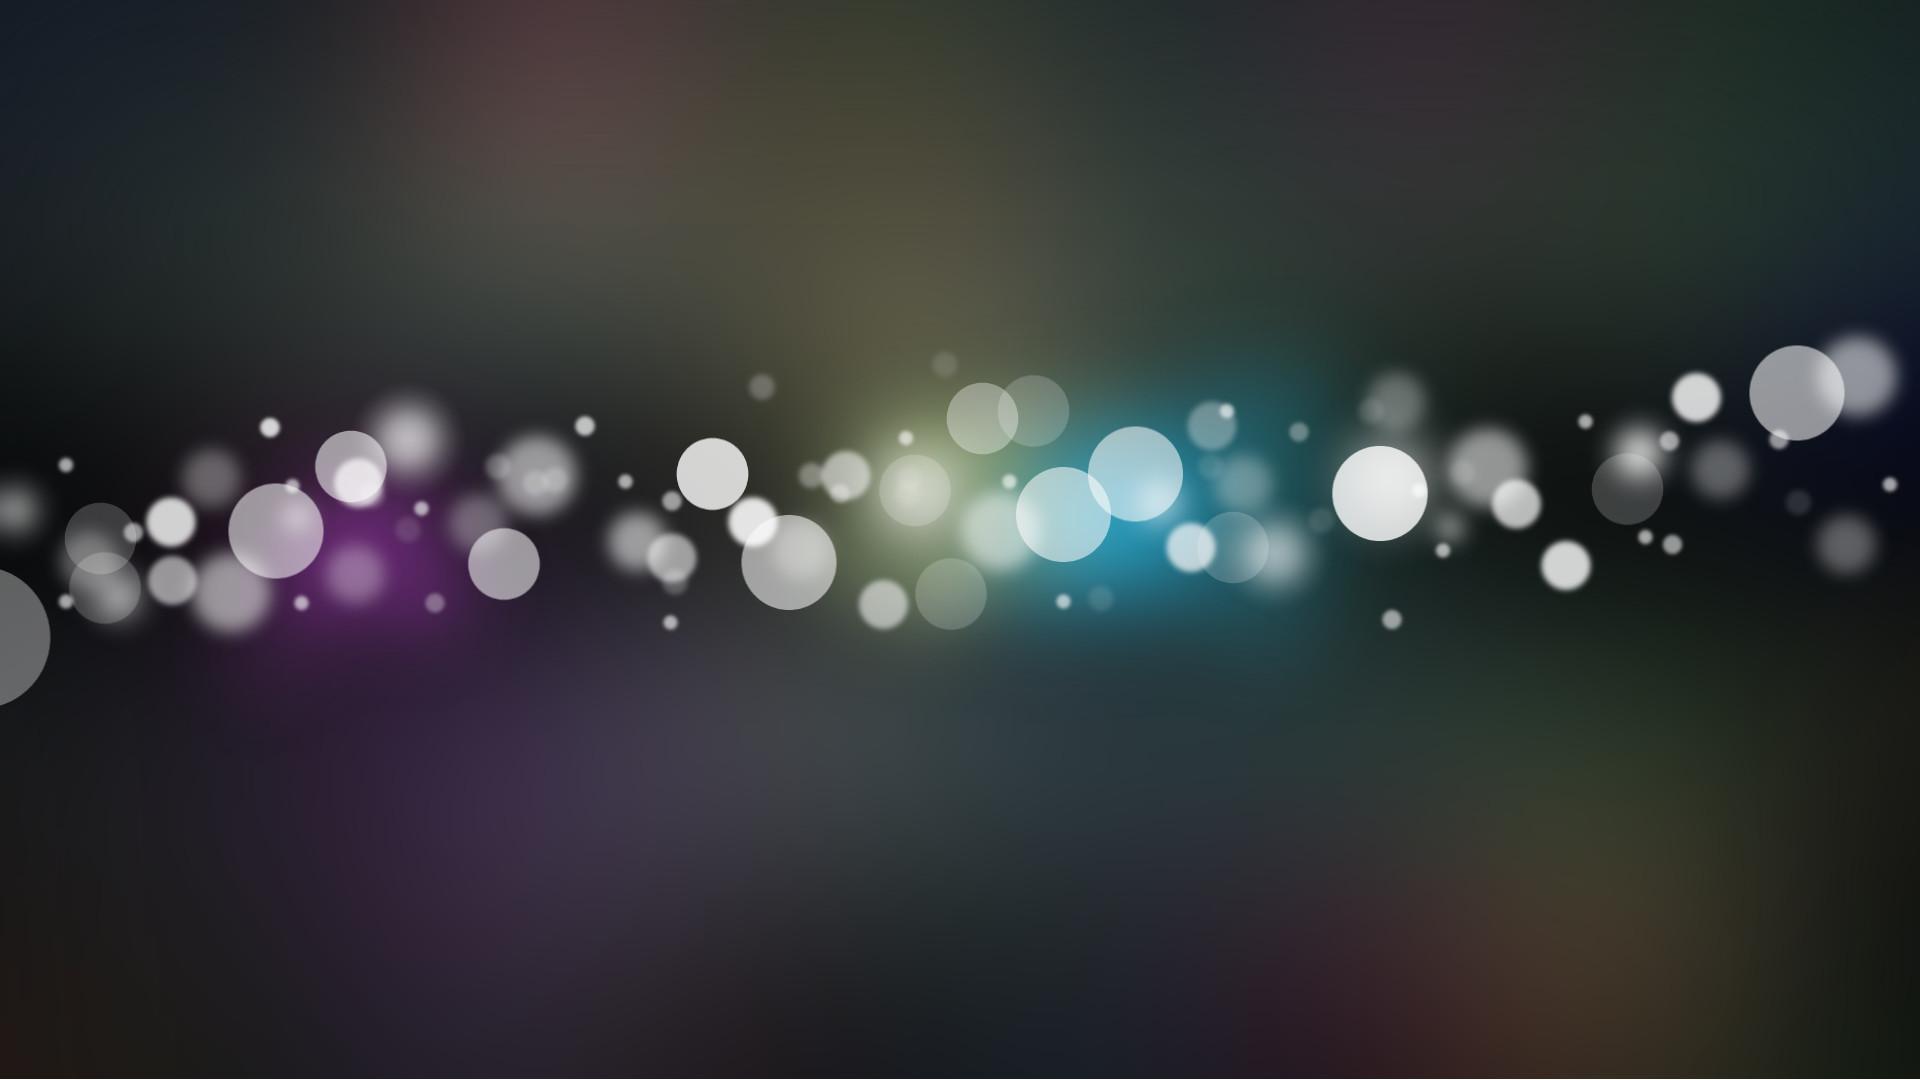 Speckled light wallpaper